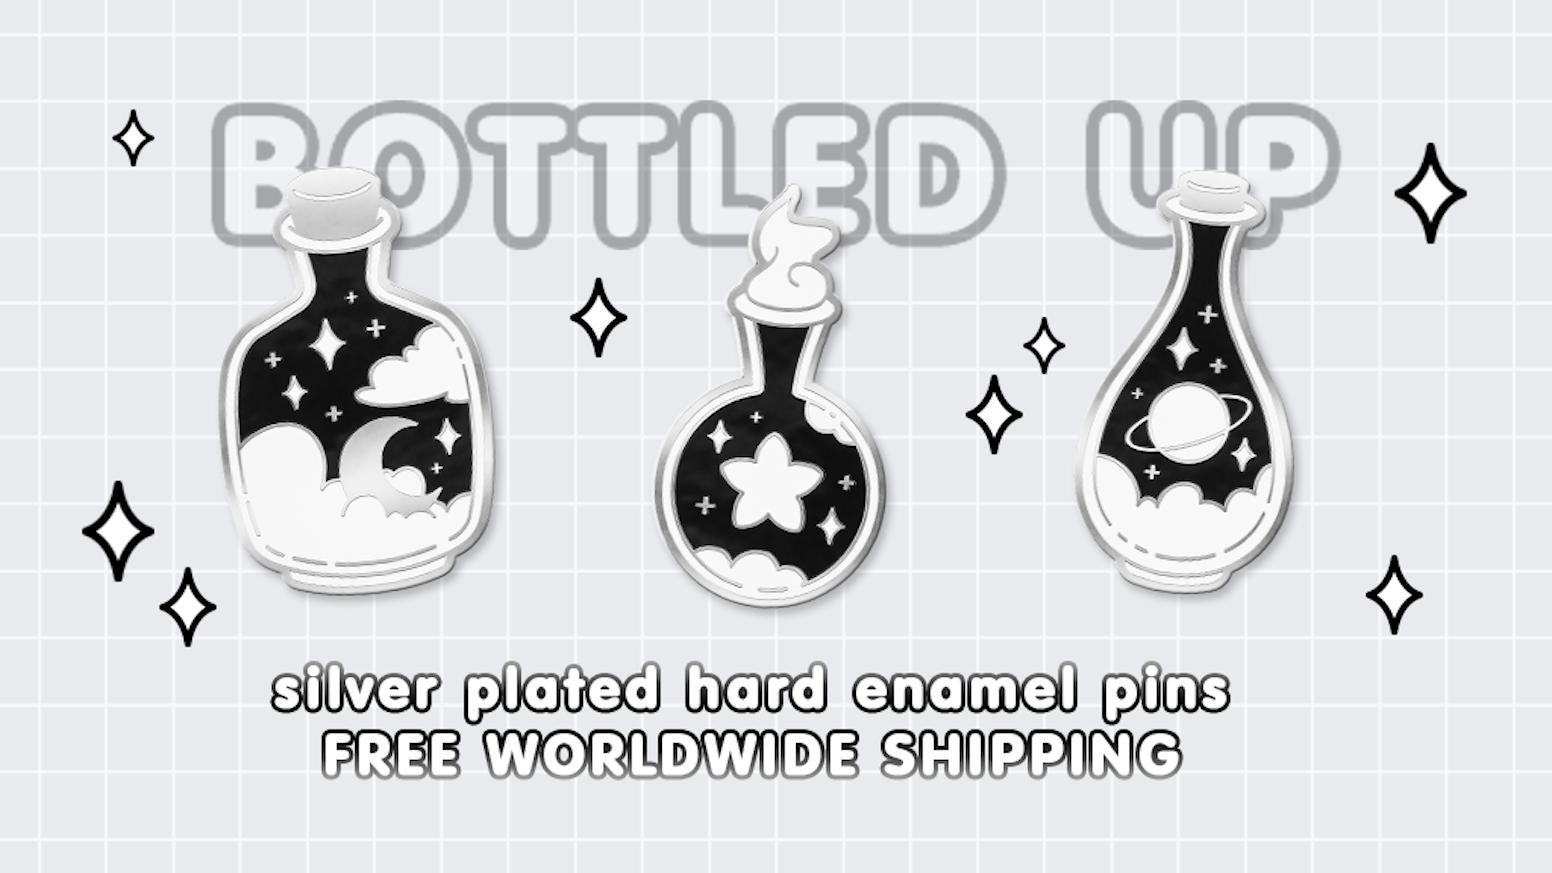 Hard enamel pin series featuring dreamy space bottle designs